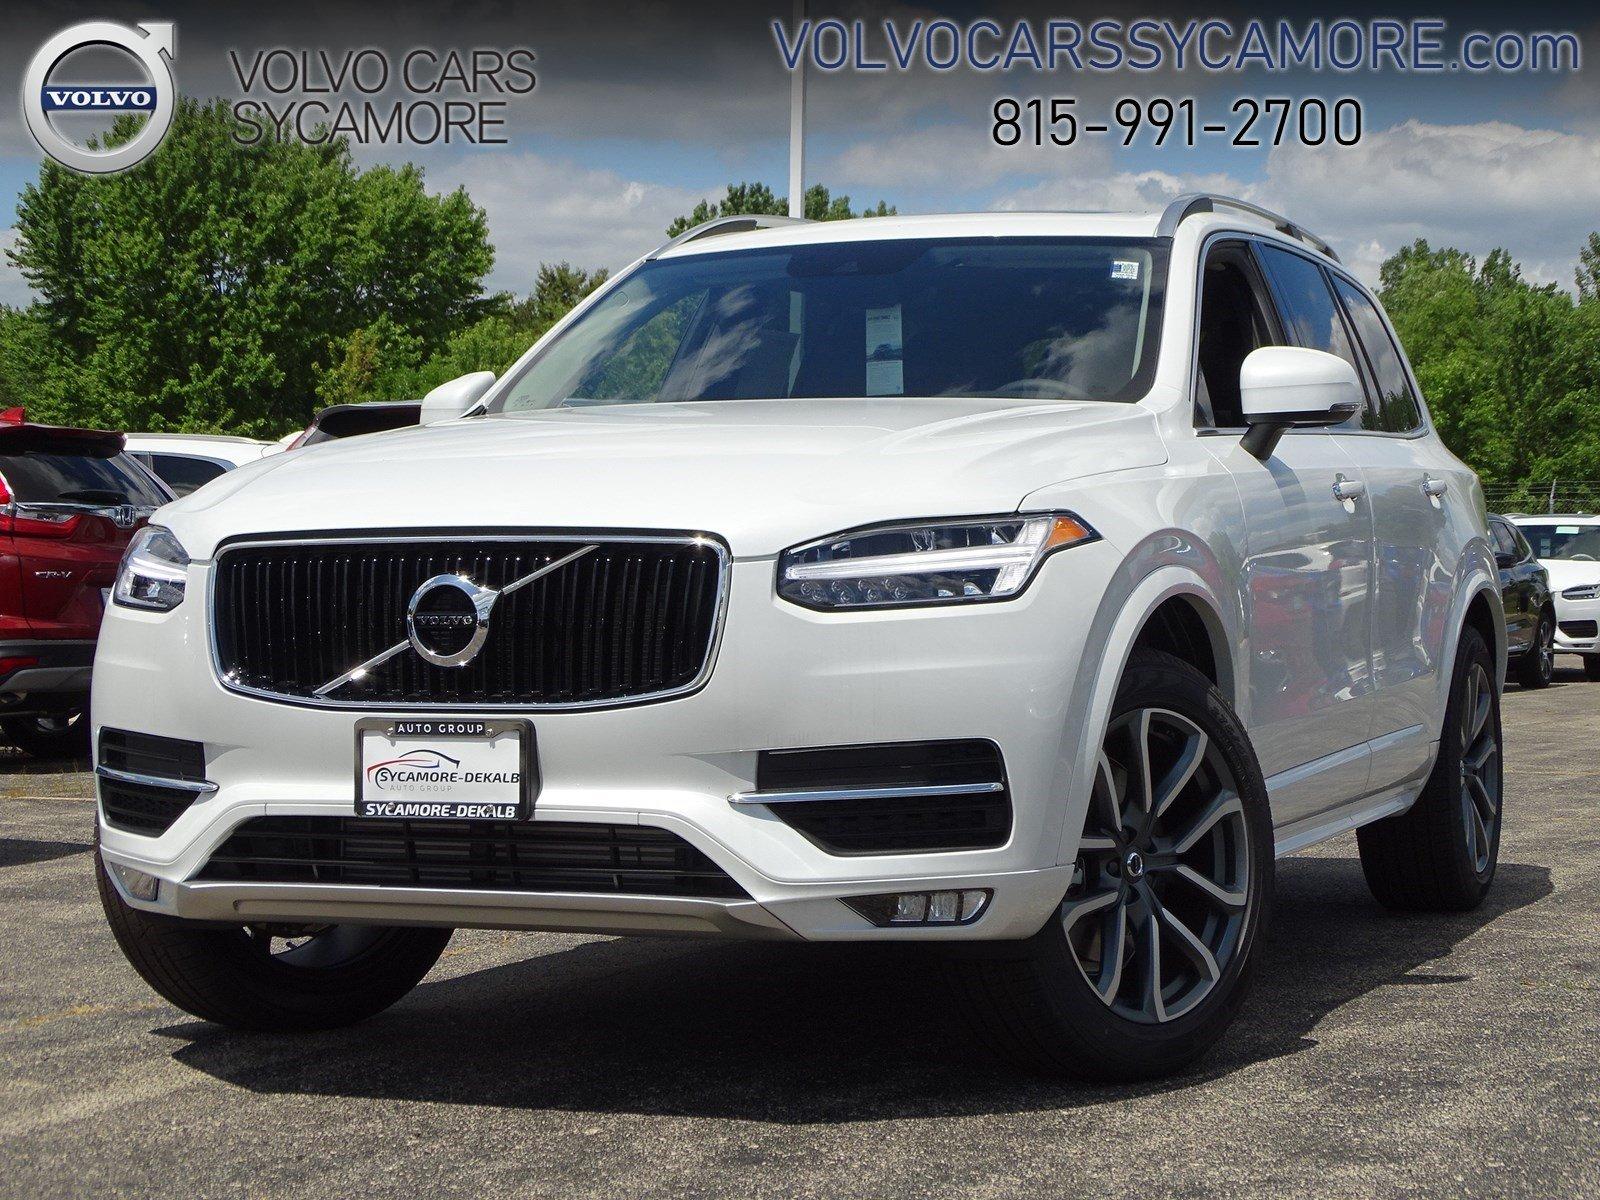 New 2019 Volvo XC90 For Sale | Sycamore IL | VIN: YV4102PK1K1485962